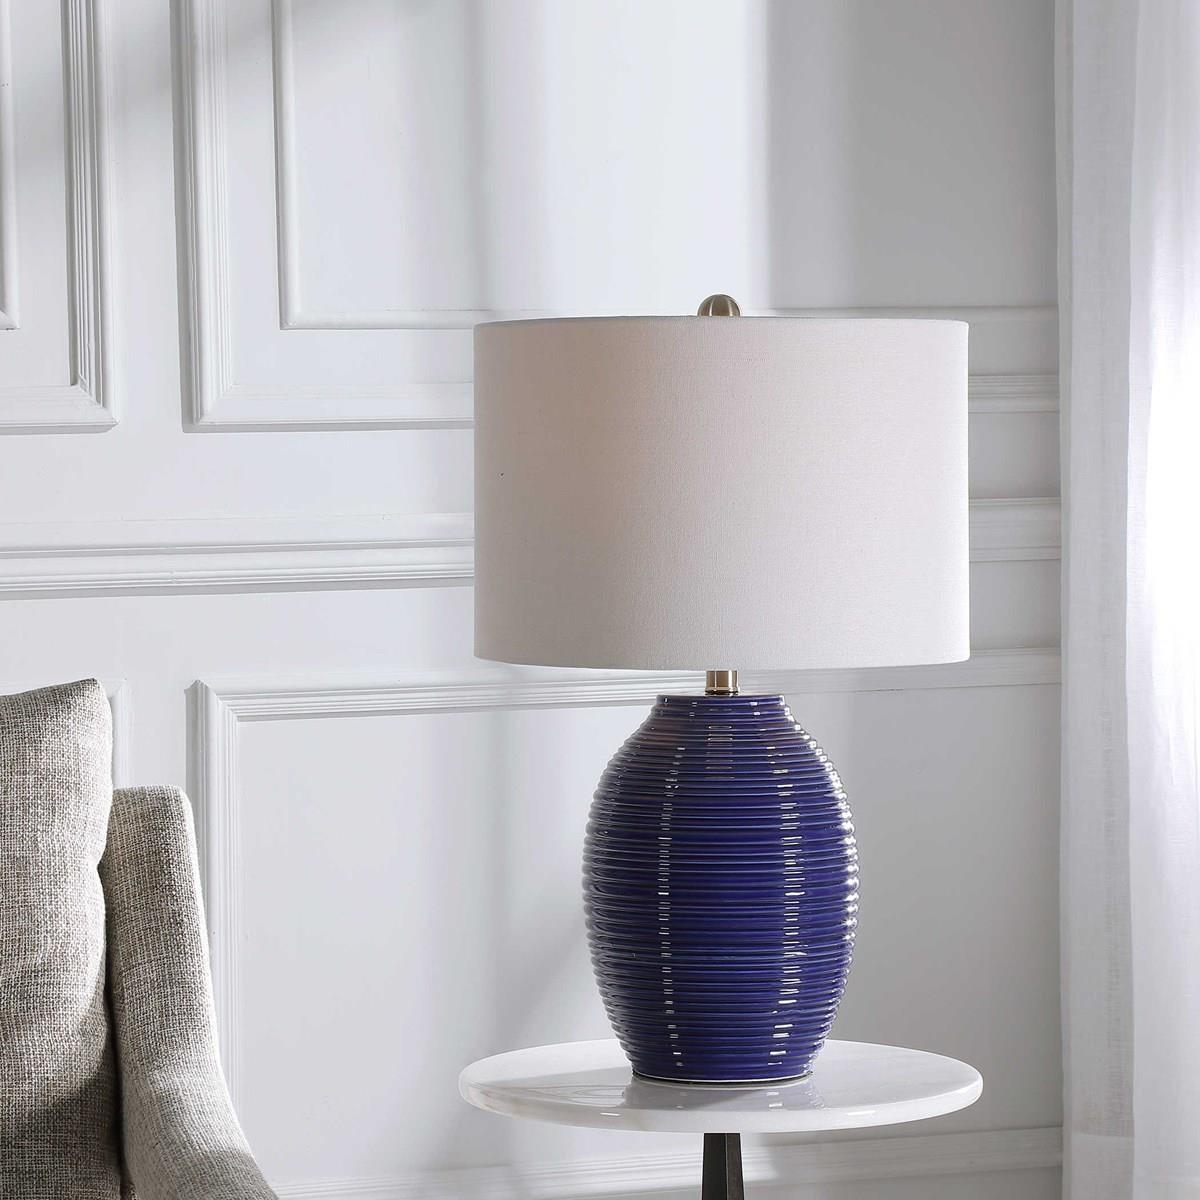 Table Lamps JULIETTE TABLE LAMP by Unique at Walker's Furniture